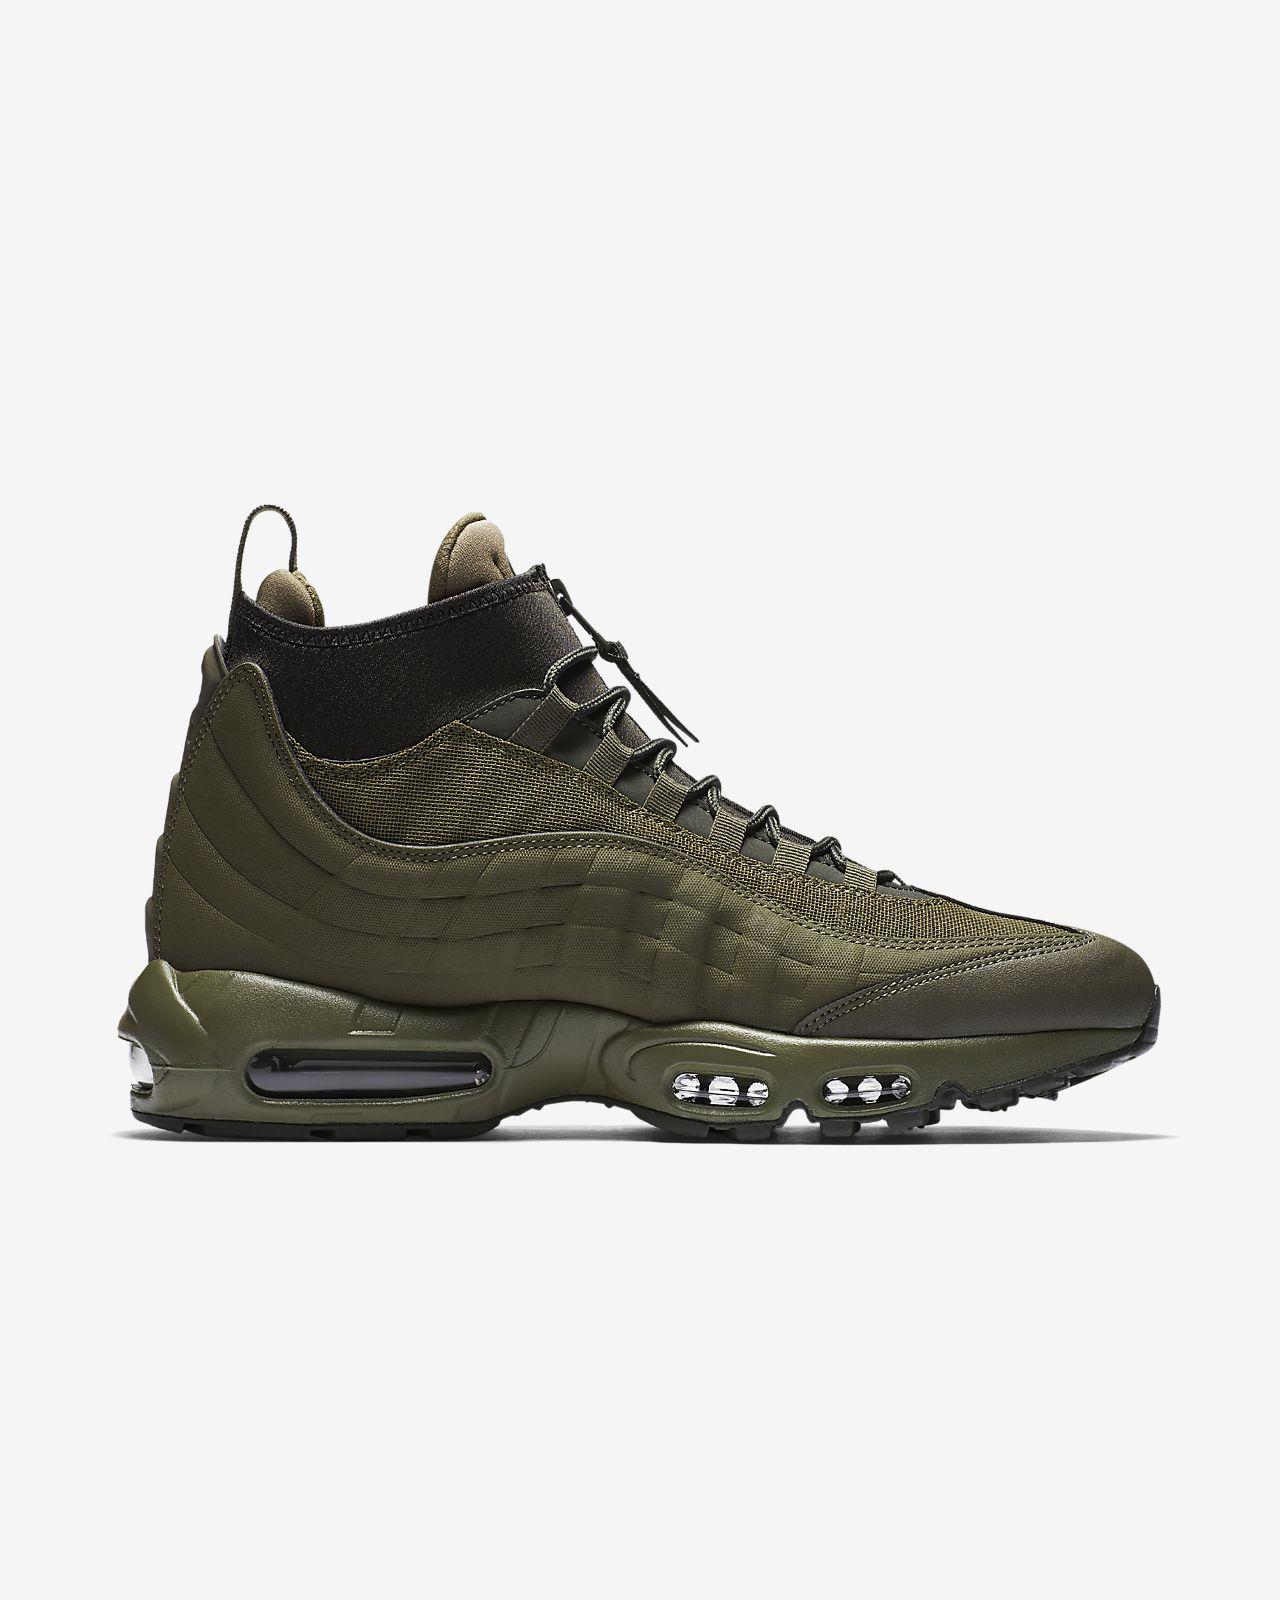 e4068f182d10a2 ... coupon code for neueste herren schwarz grün nike air max 95 sneakerboot  olive associate degree. ...